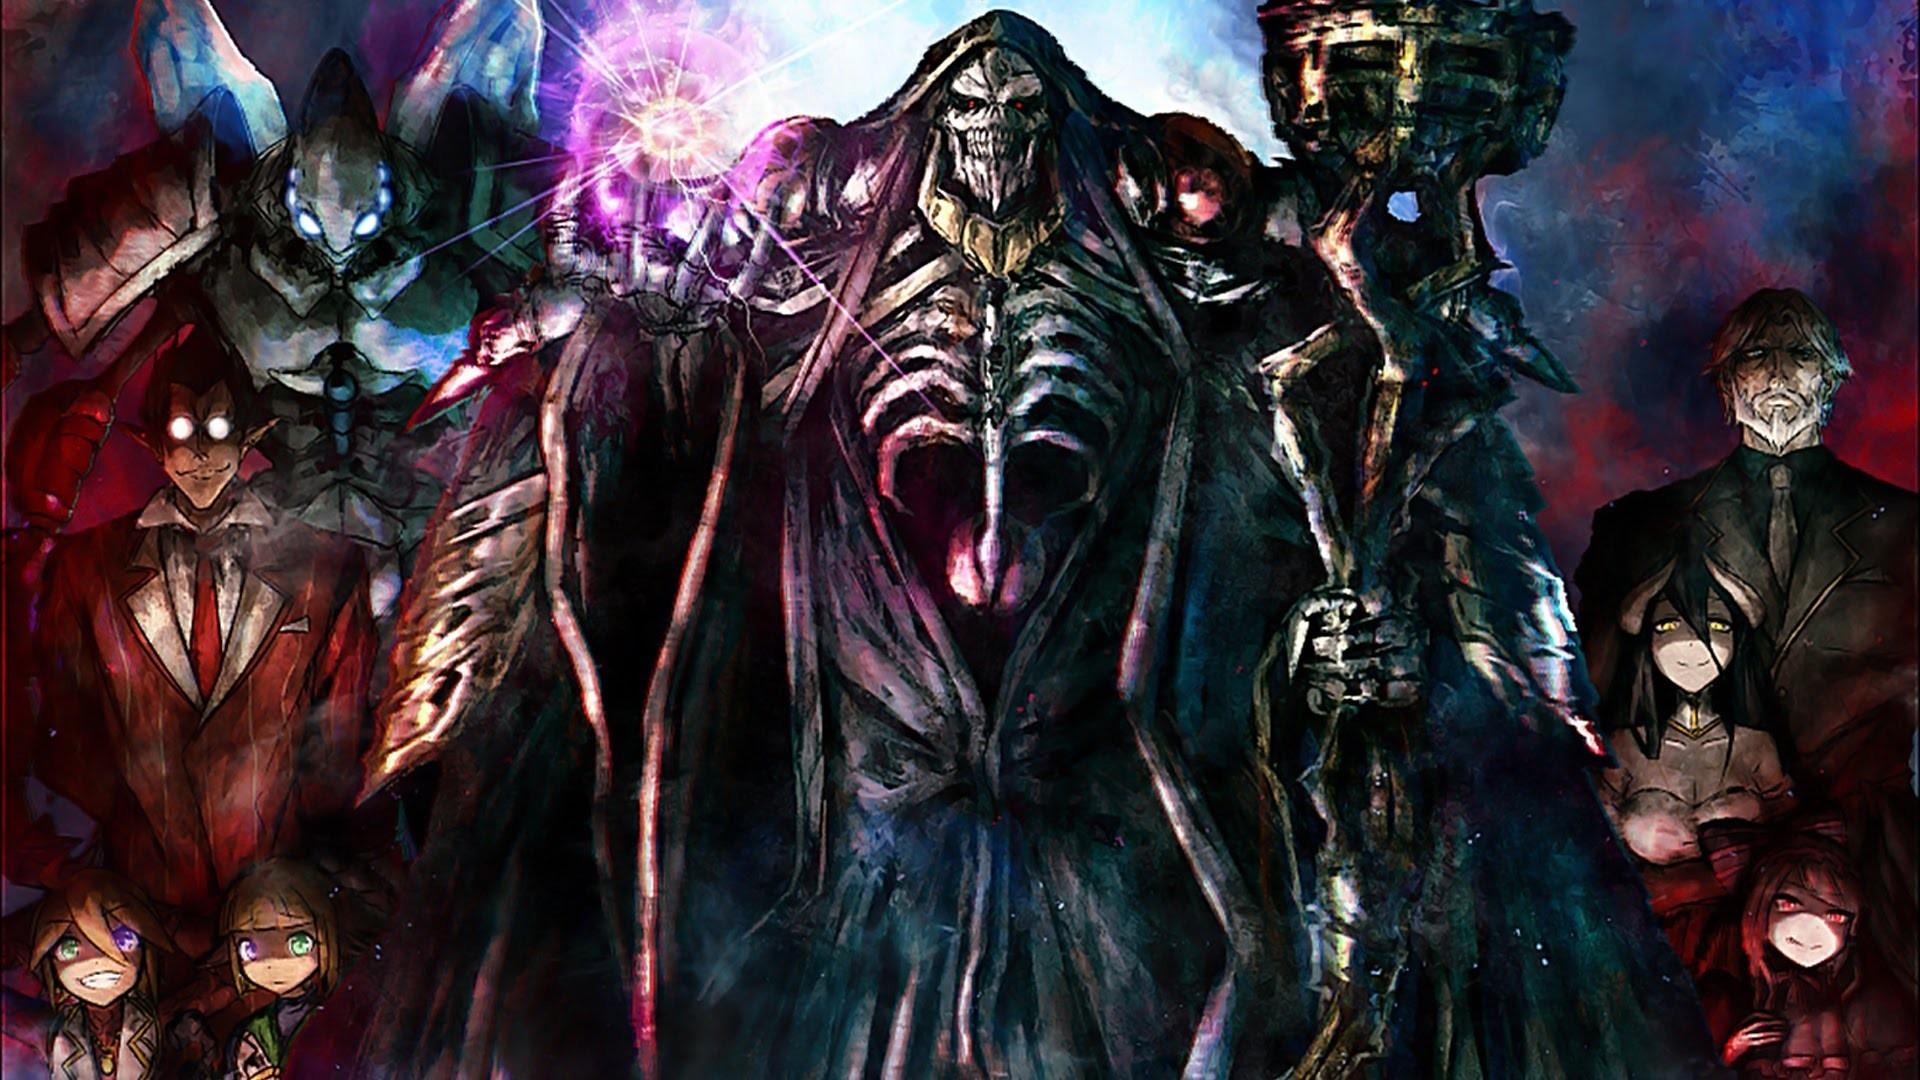 Anime Overlord (anime) Albedo (OverLord) Cocytus (Overlord)  Momonga Aura